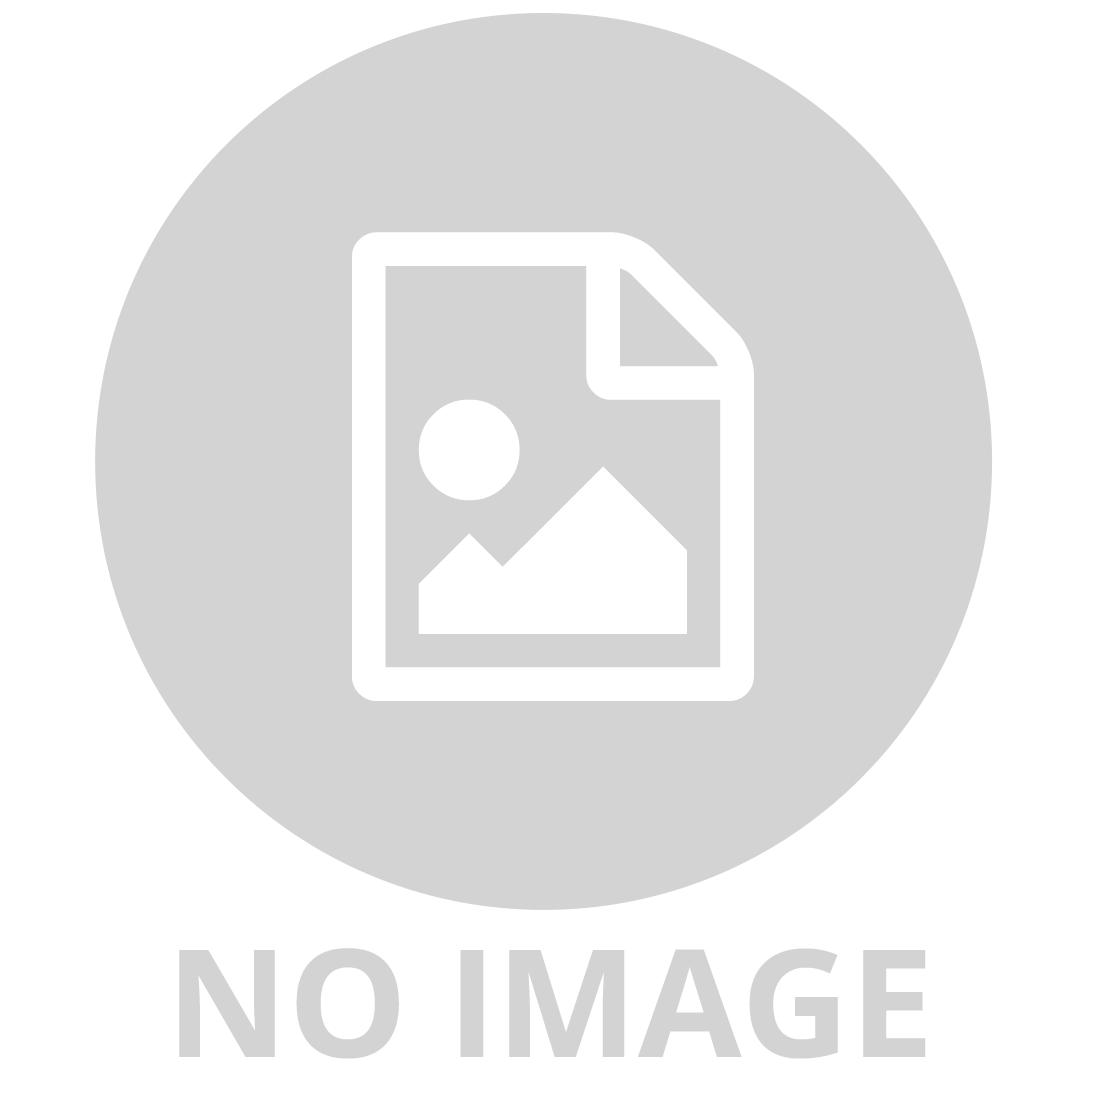 LEGO 11006 CLASSIC CREATIVE BLUE BRICKS